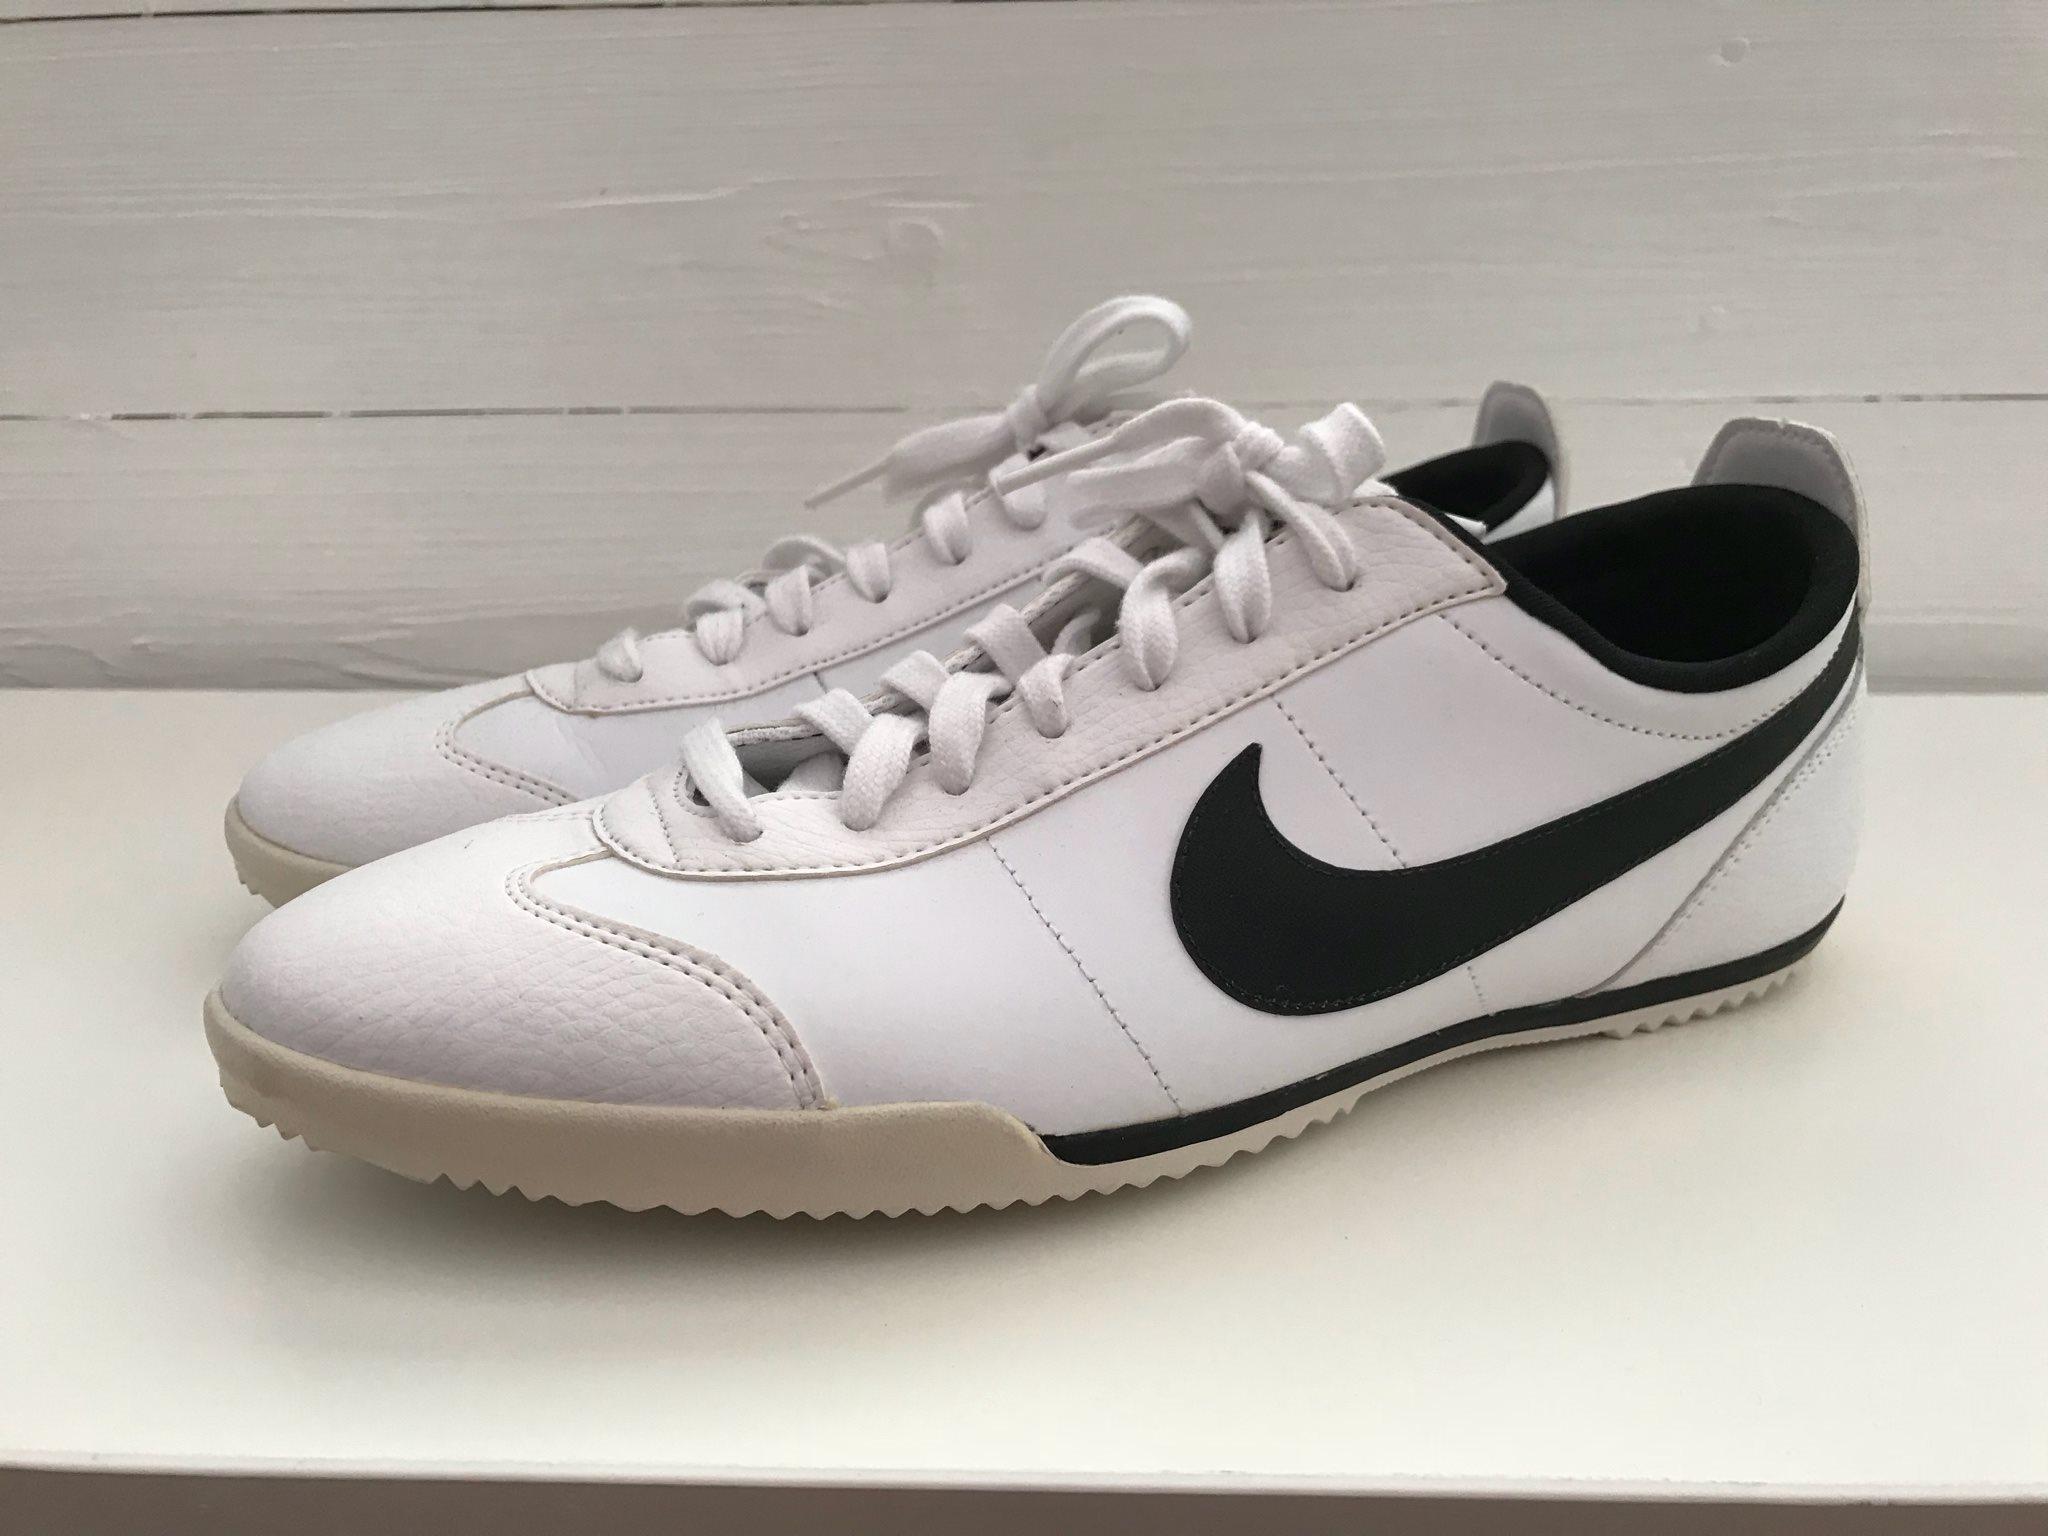 promo code 28b3e 1e0ca Nike air huarache löparskor kvinnor vit se87502 skor rea online,nya  produkter,Tillverkare auktorisation